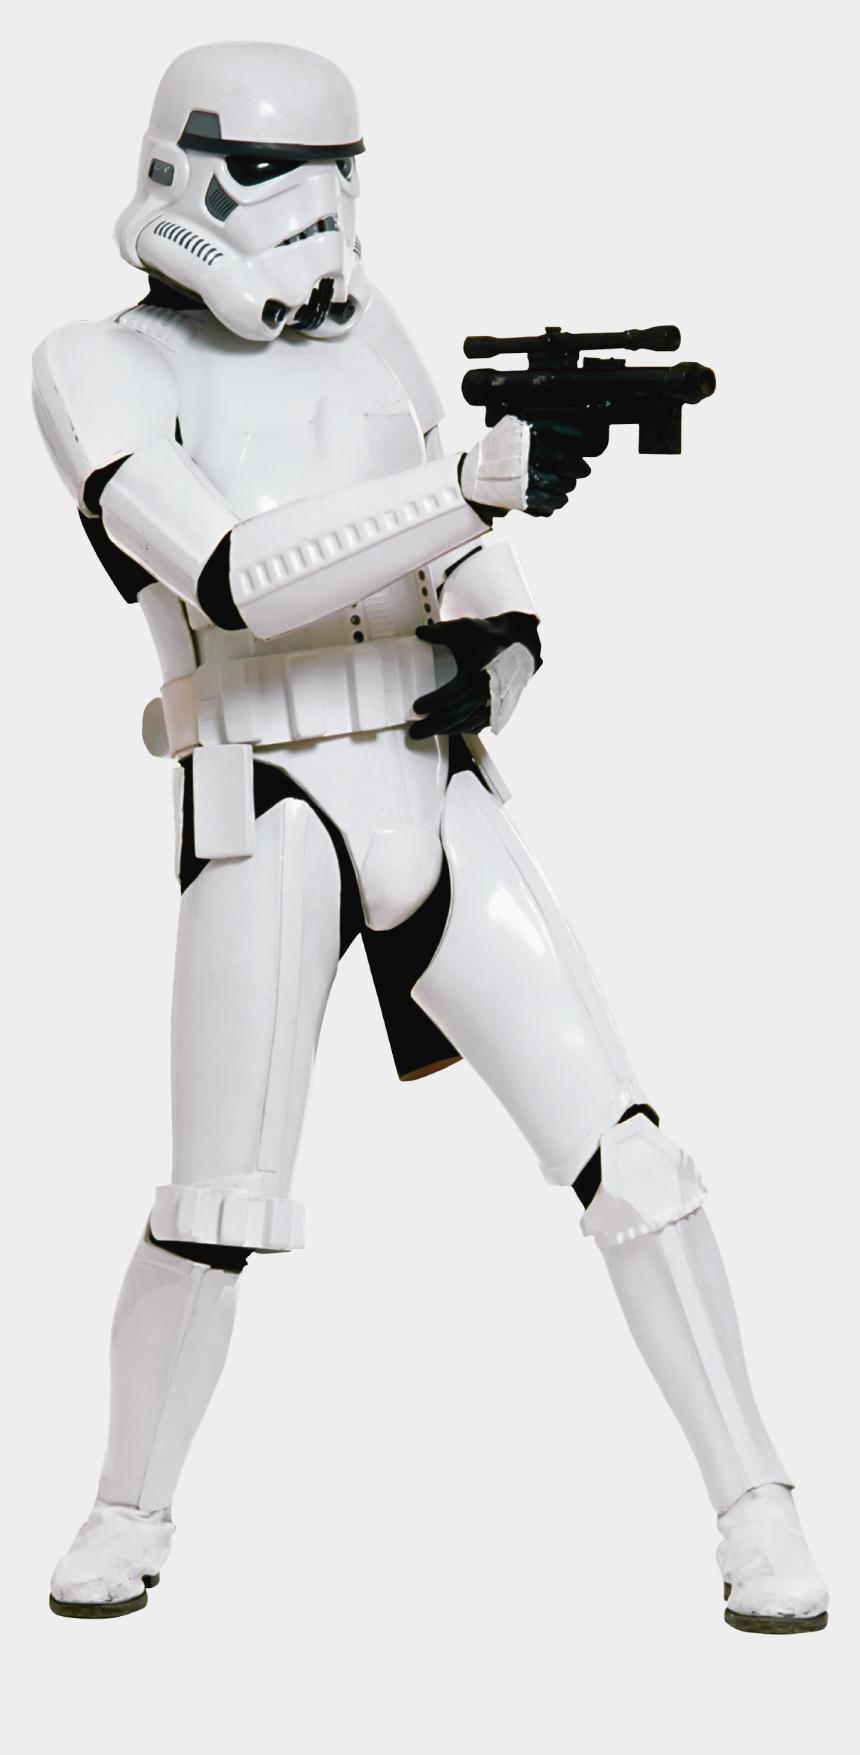 starwars clipart, Cartoons - Assault Riffle Clipart Star Wars - Star Wars Storm Trooper Png